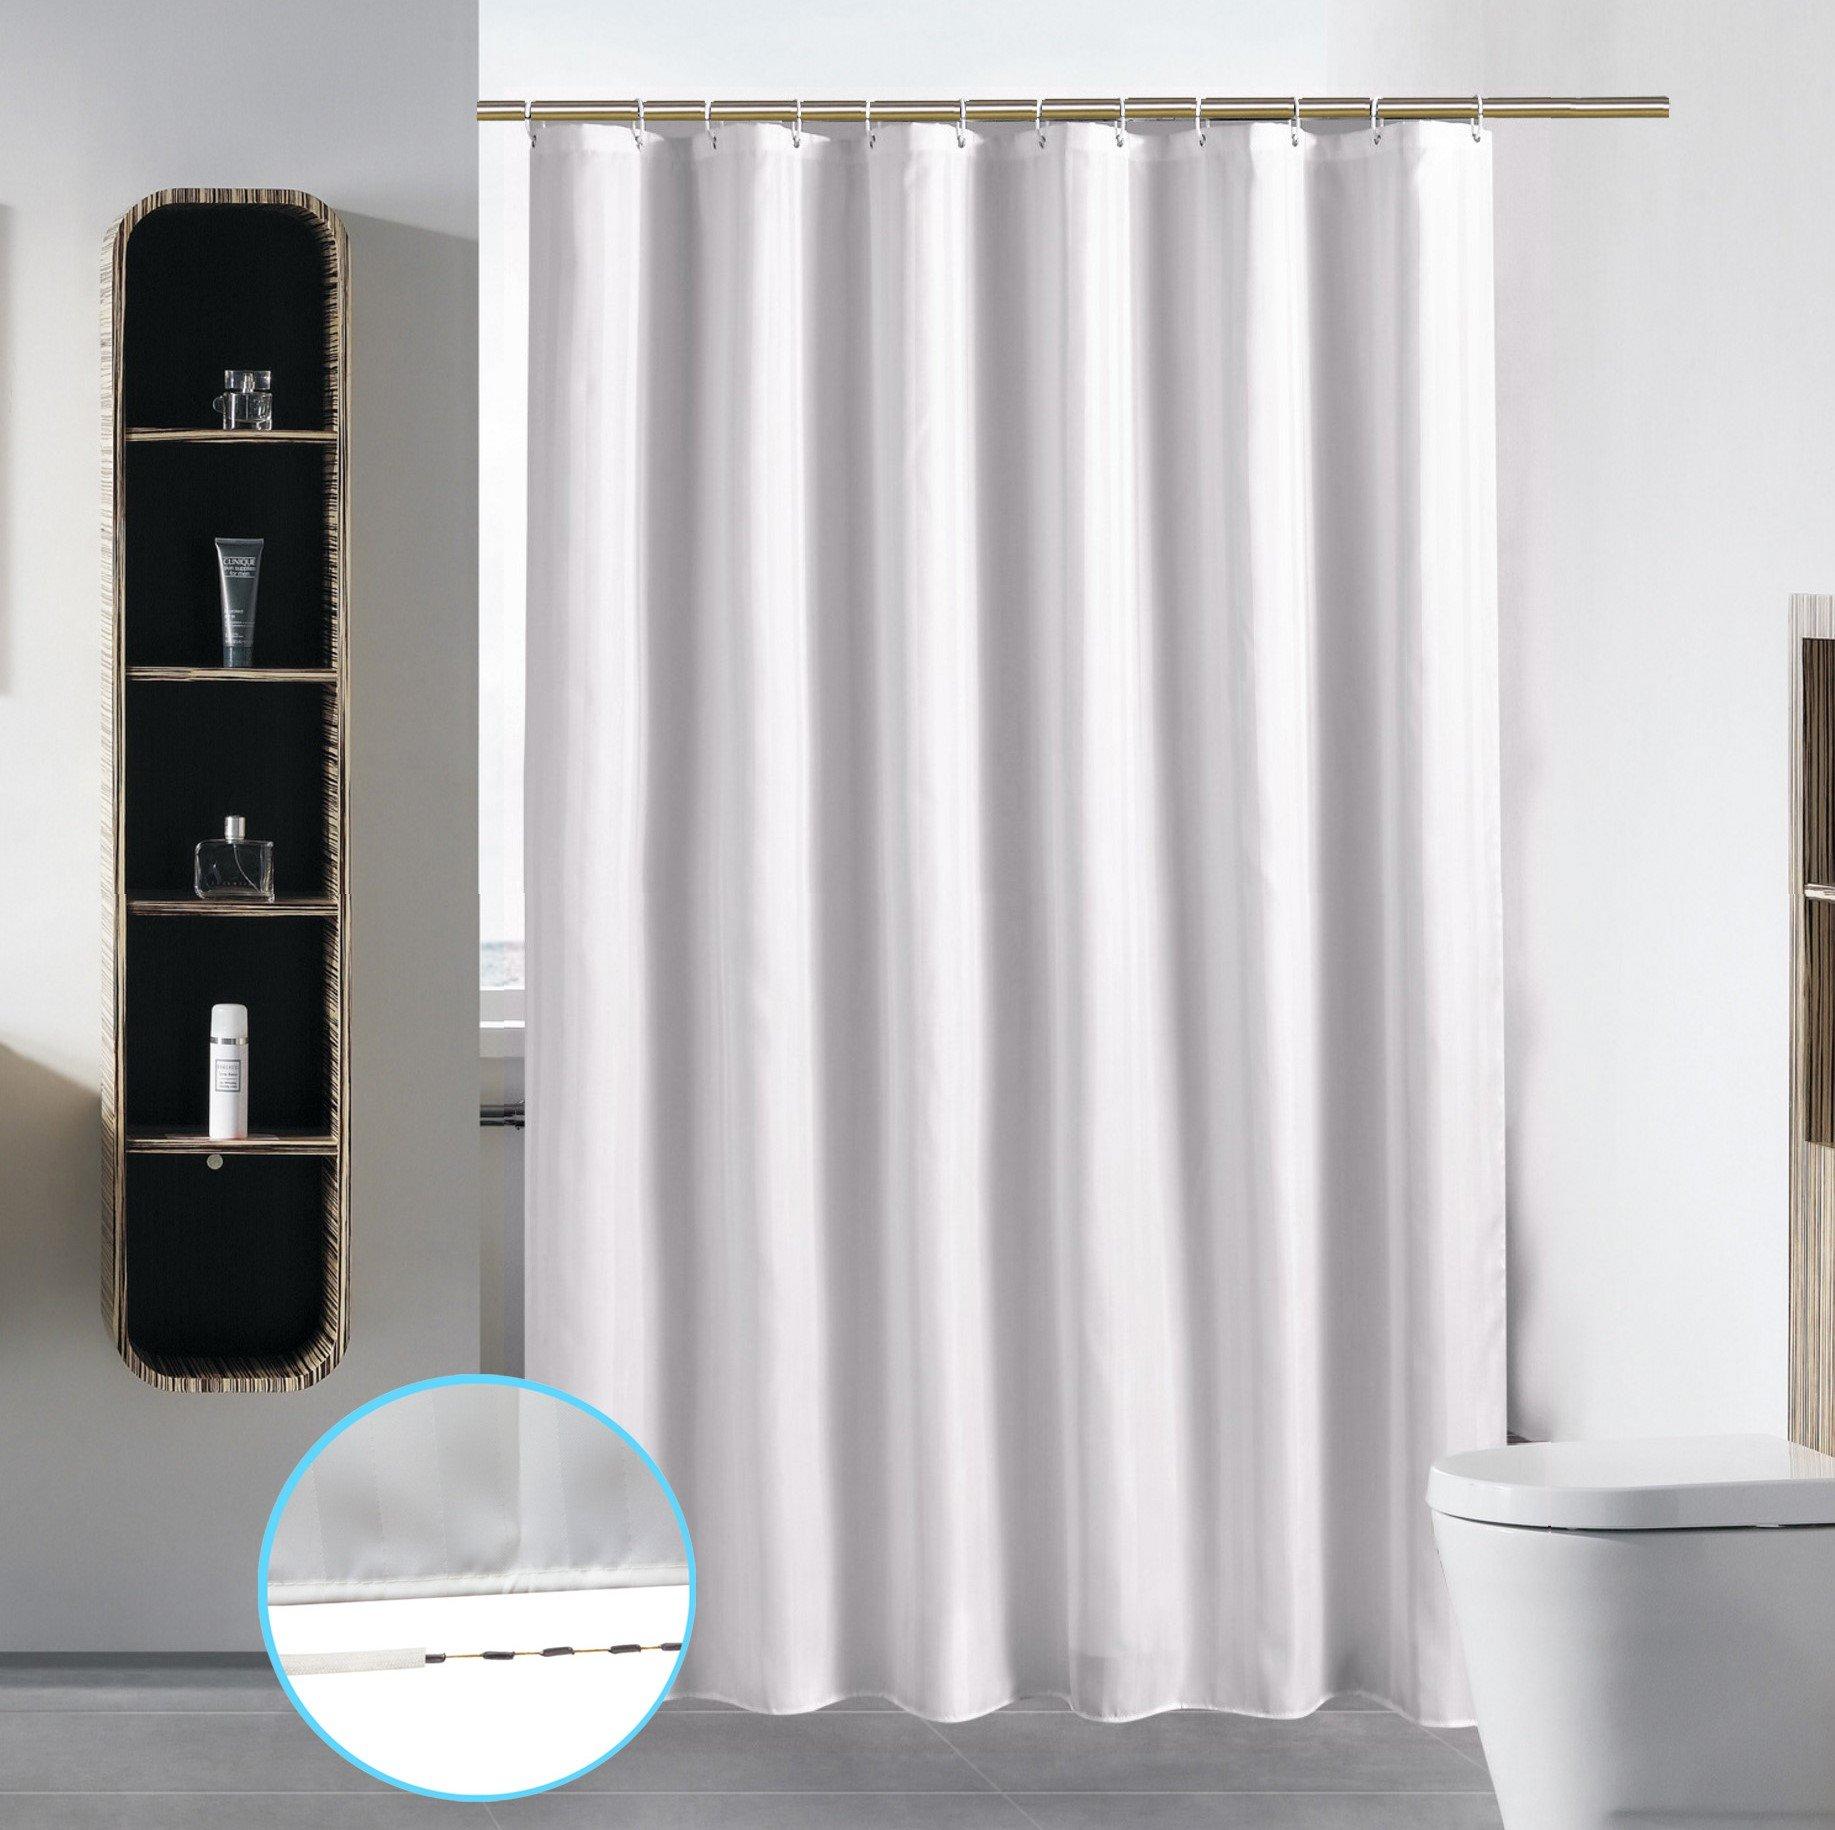 S·Lattye Bathroom Shower Curtain Liner Washable Fabric Waterproof Polyester (Hotel Quality Friendly Damask Stripe Cortinas Baño) & Heavy Duty Plastic Hooks Set - Standard 72 x 72, White